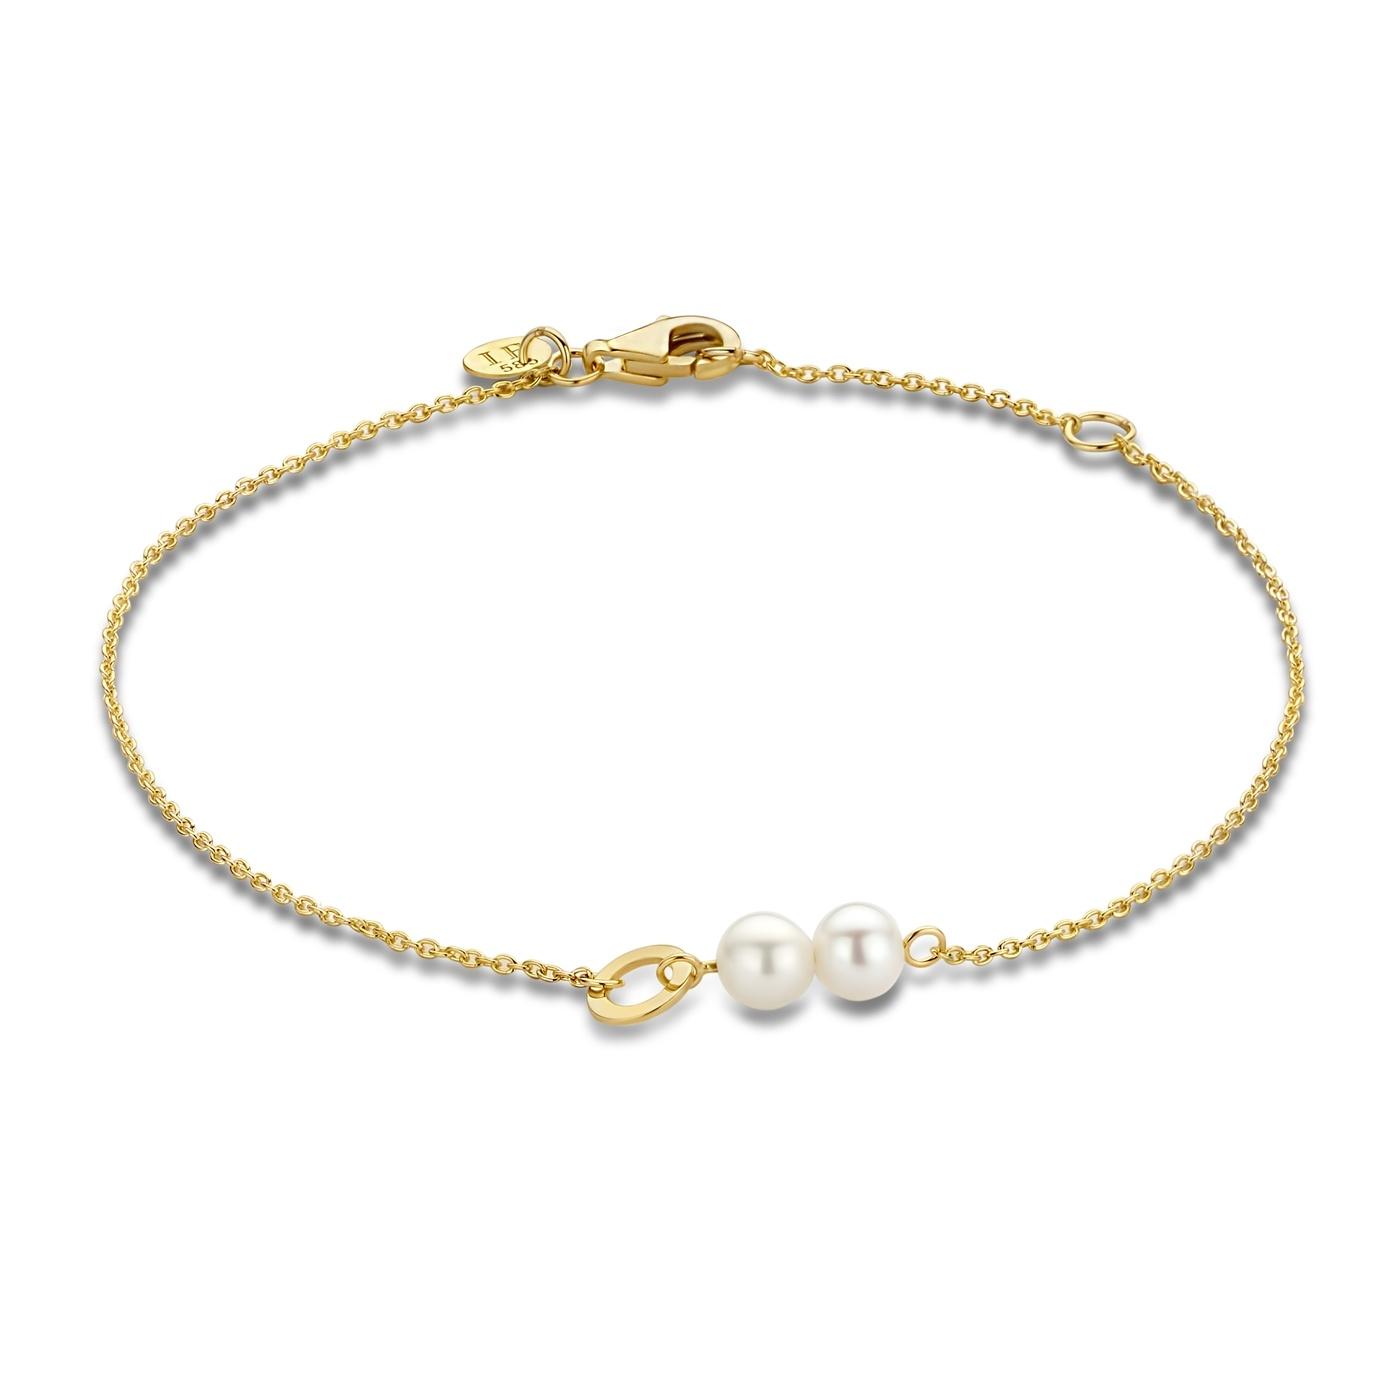 Isabel Bernard Belleville Mila bracciale in oro 14 carati